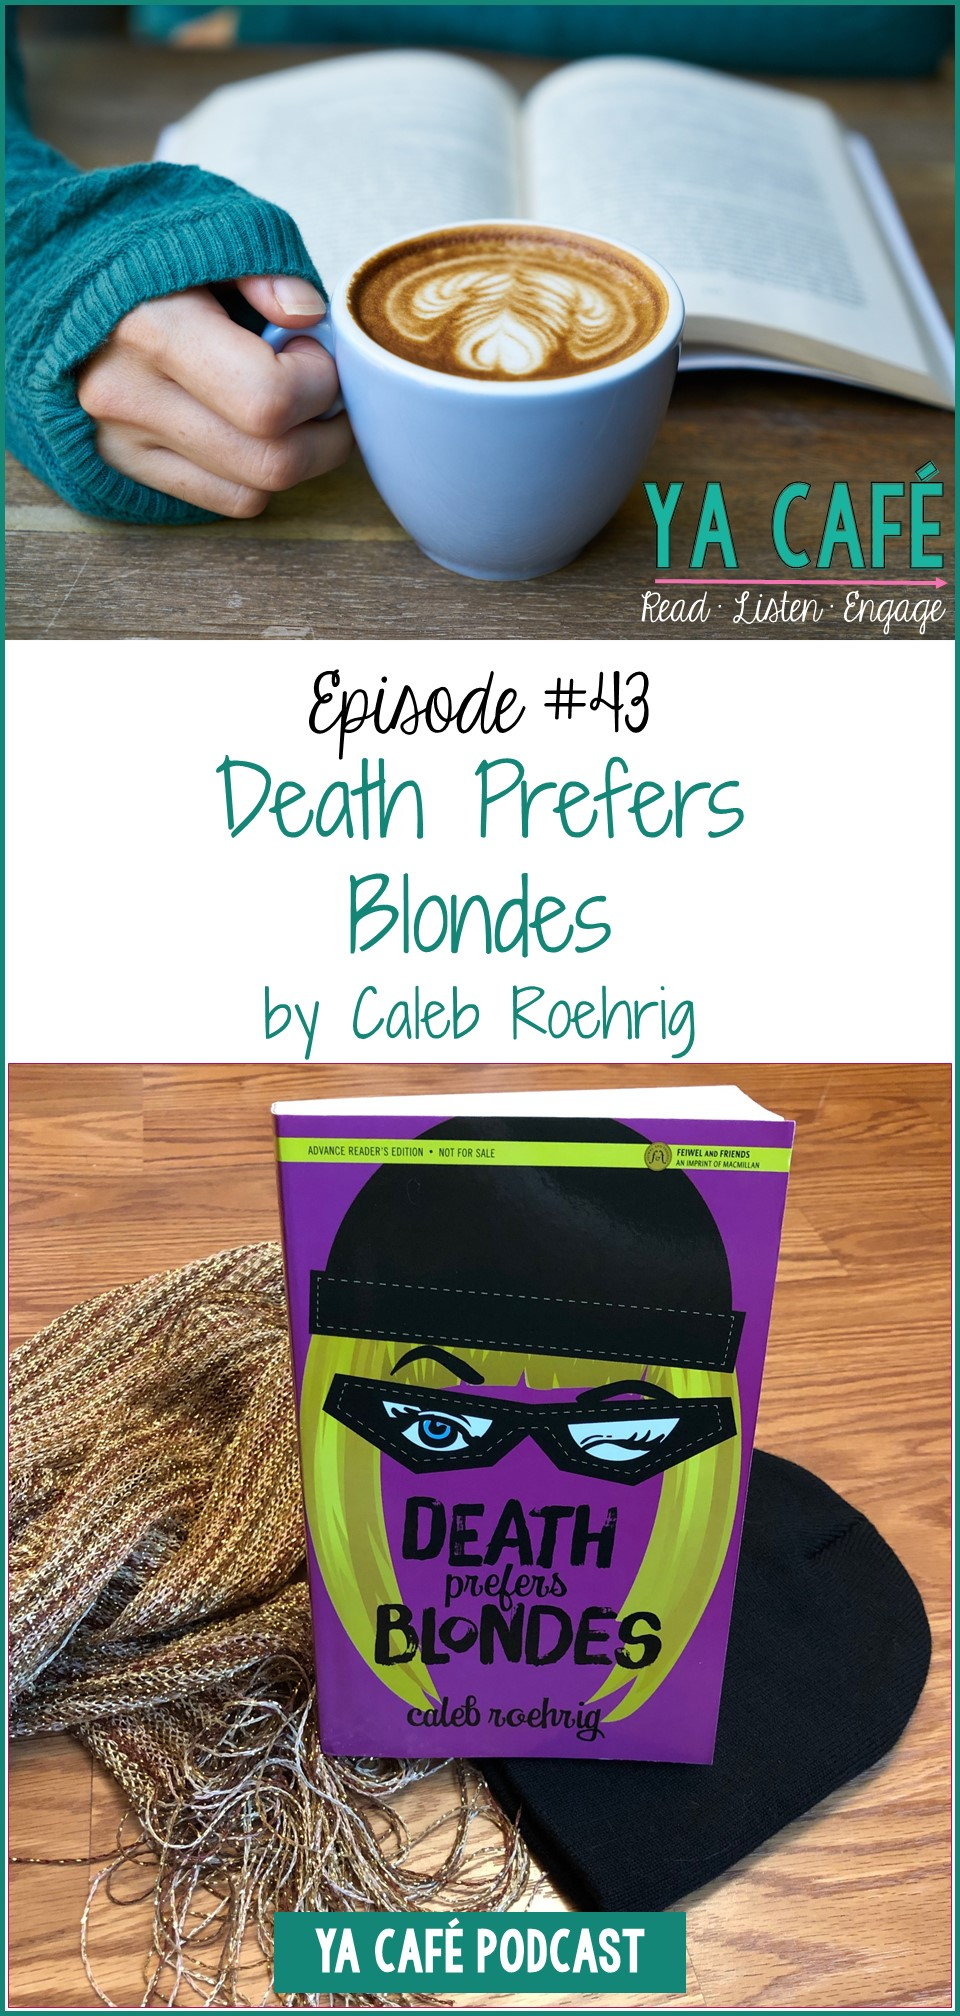 43 Death Prefers Blondes by Caleb Roehrig